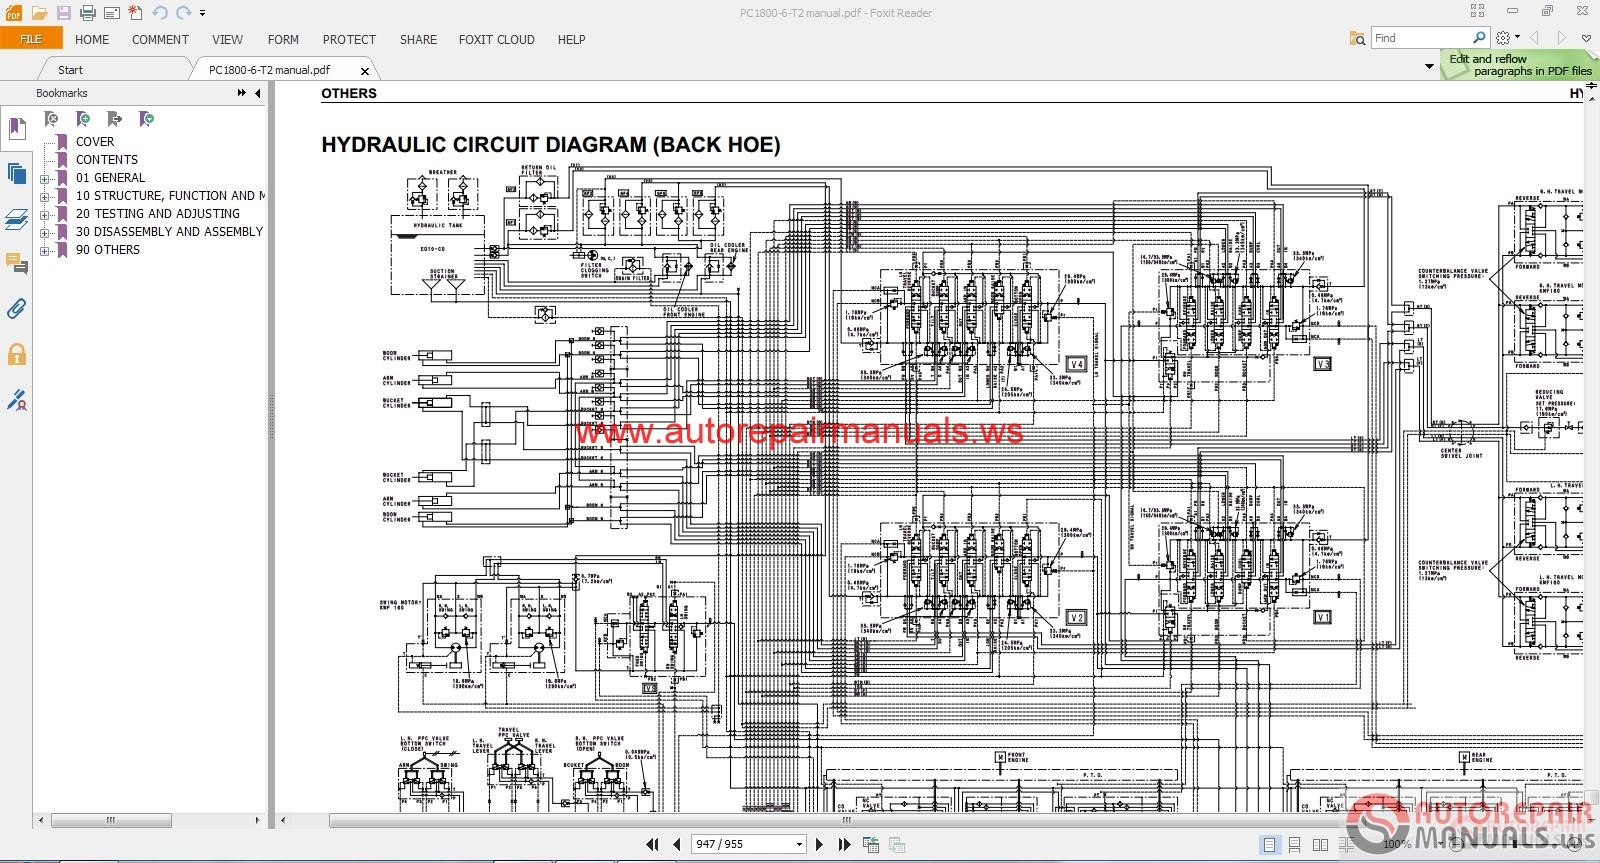 Komatsu Forklift Wiring Diagrams Acc 50 Not Lossing Diagram D31p Schematic D31 Schematics Manuals Fg25 Manual